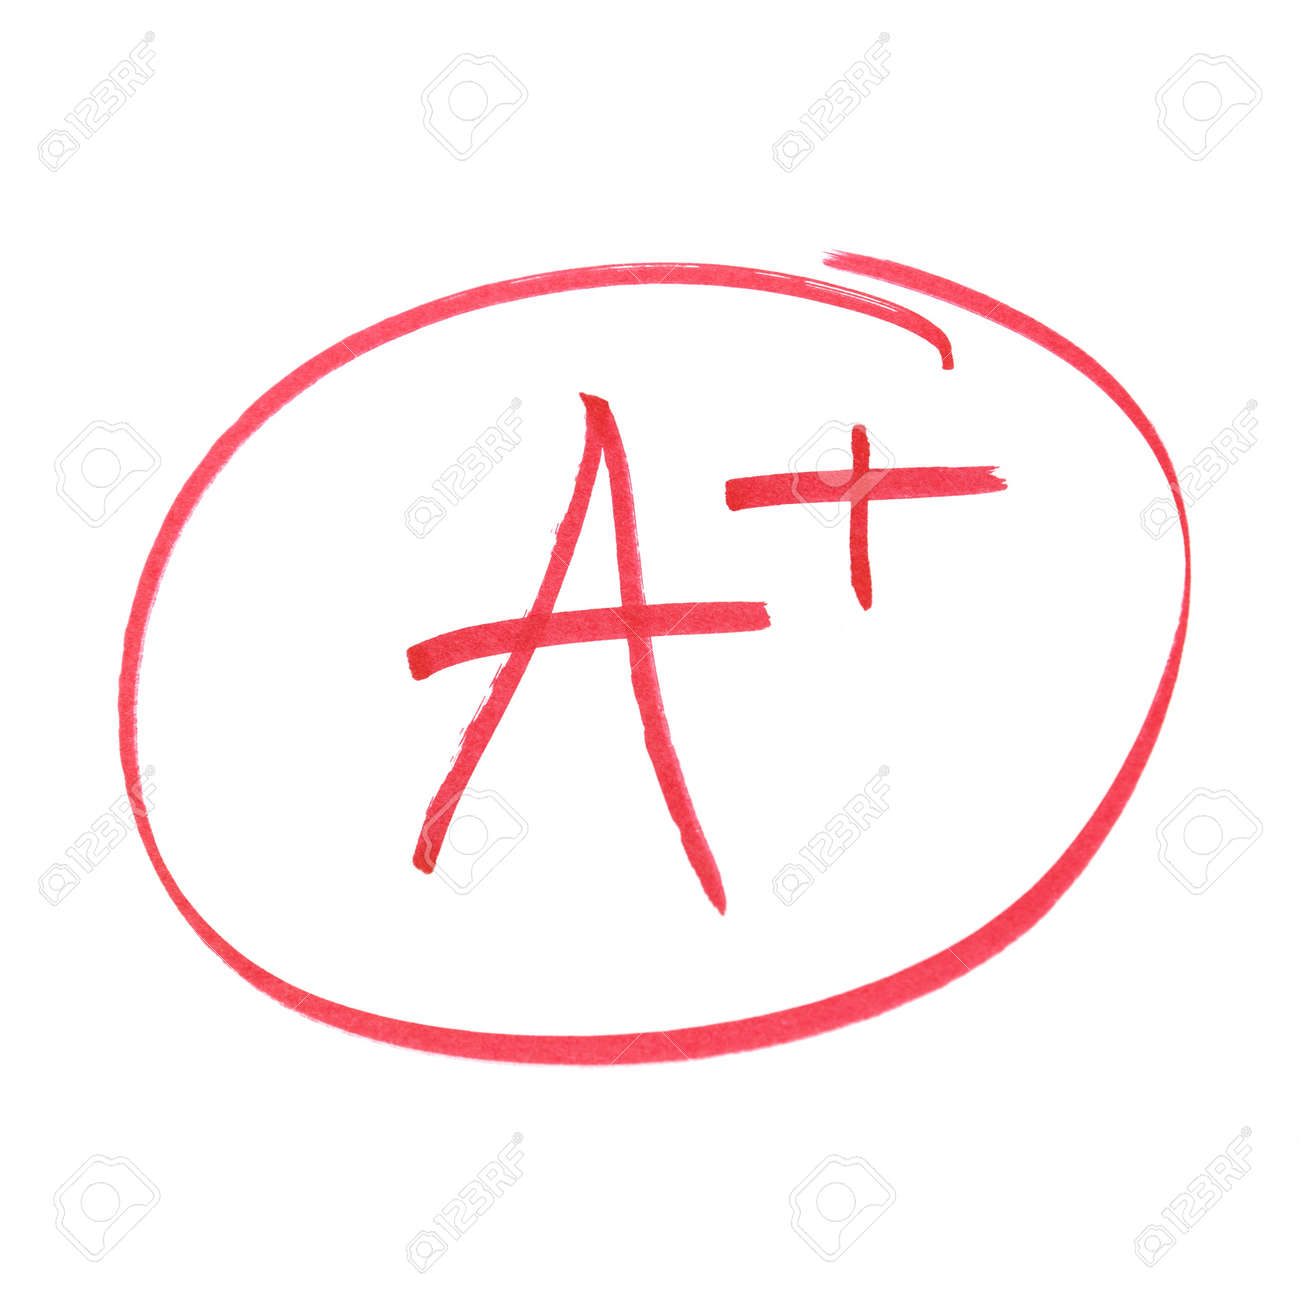 A handwritten grade for the highest achievements. Stock Photo - 9172892